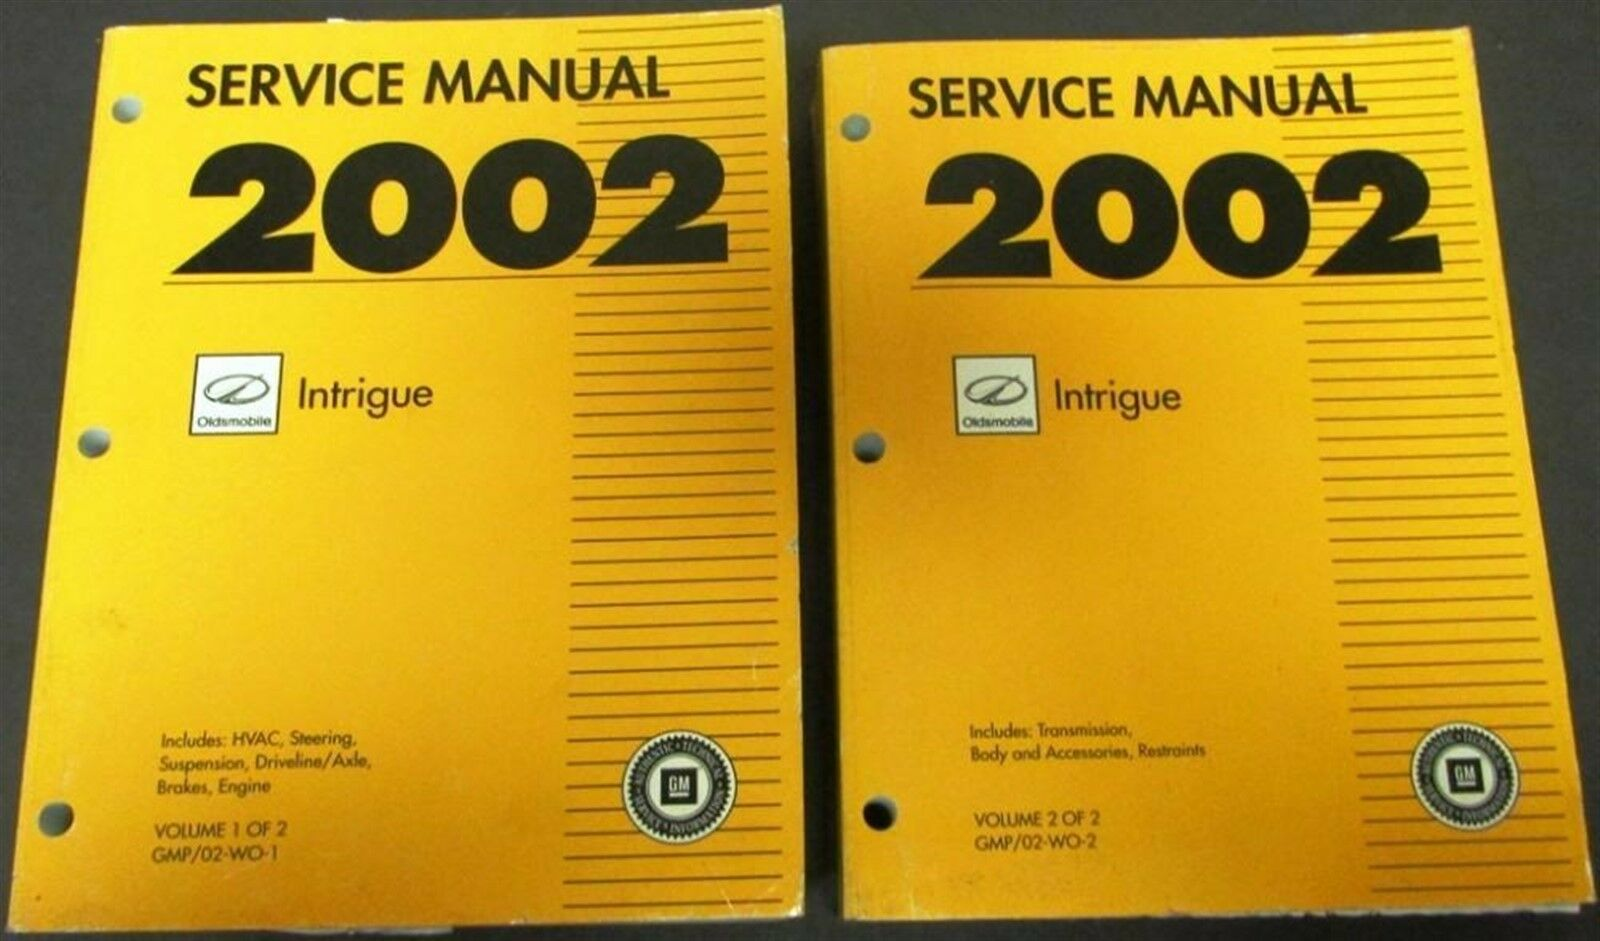 2002 Oldsmobile Intrigue Dealer Service Shop Manual Set Repair Engine Wiring A C